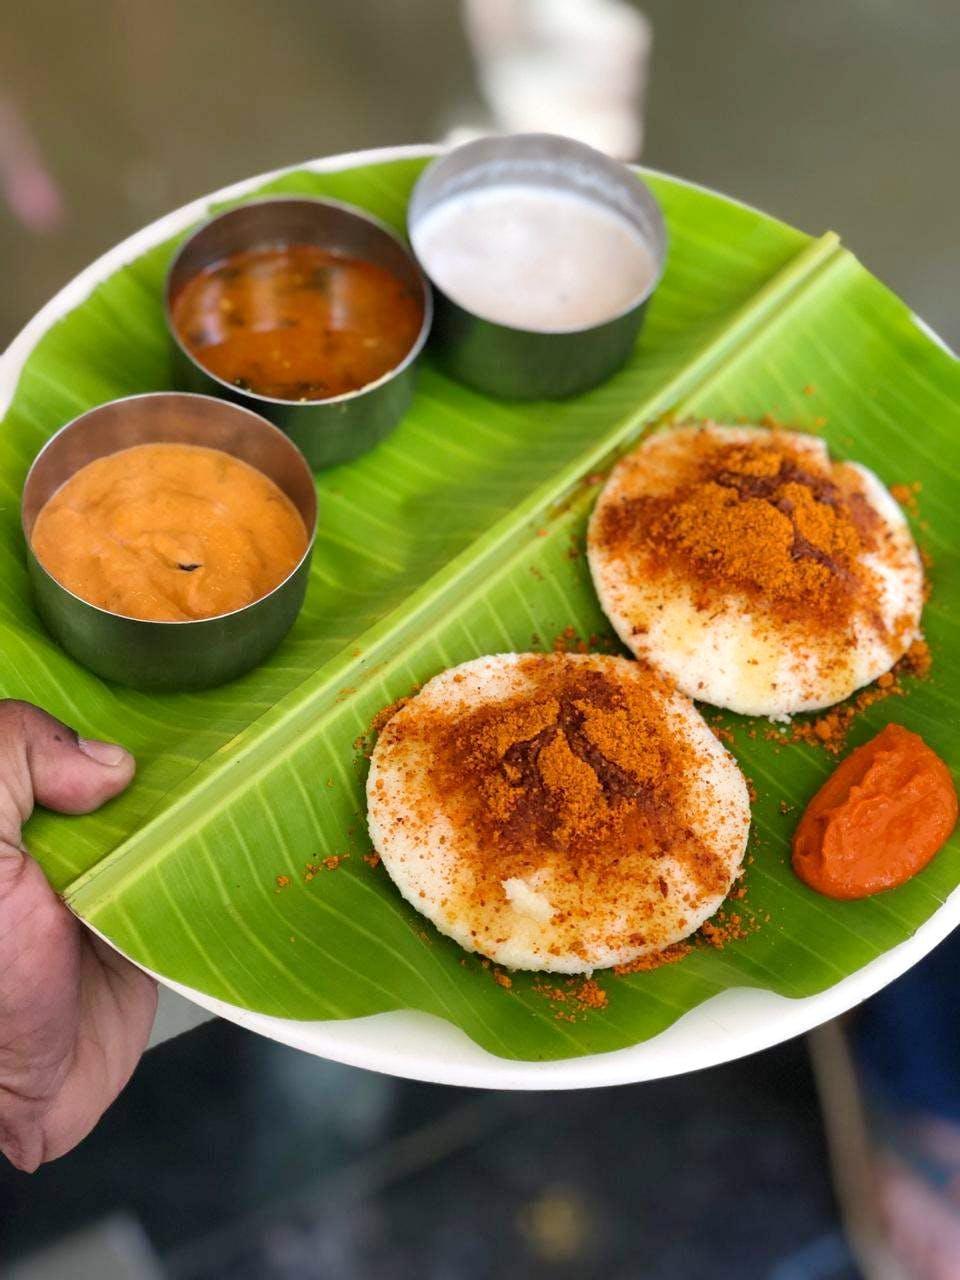 Dish,Food,Cuisine,Ingredient,Produce,Vegetarian food,Indian cuisine,Recipe,Breakfast,Wingko